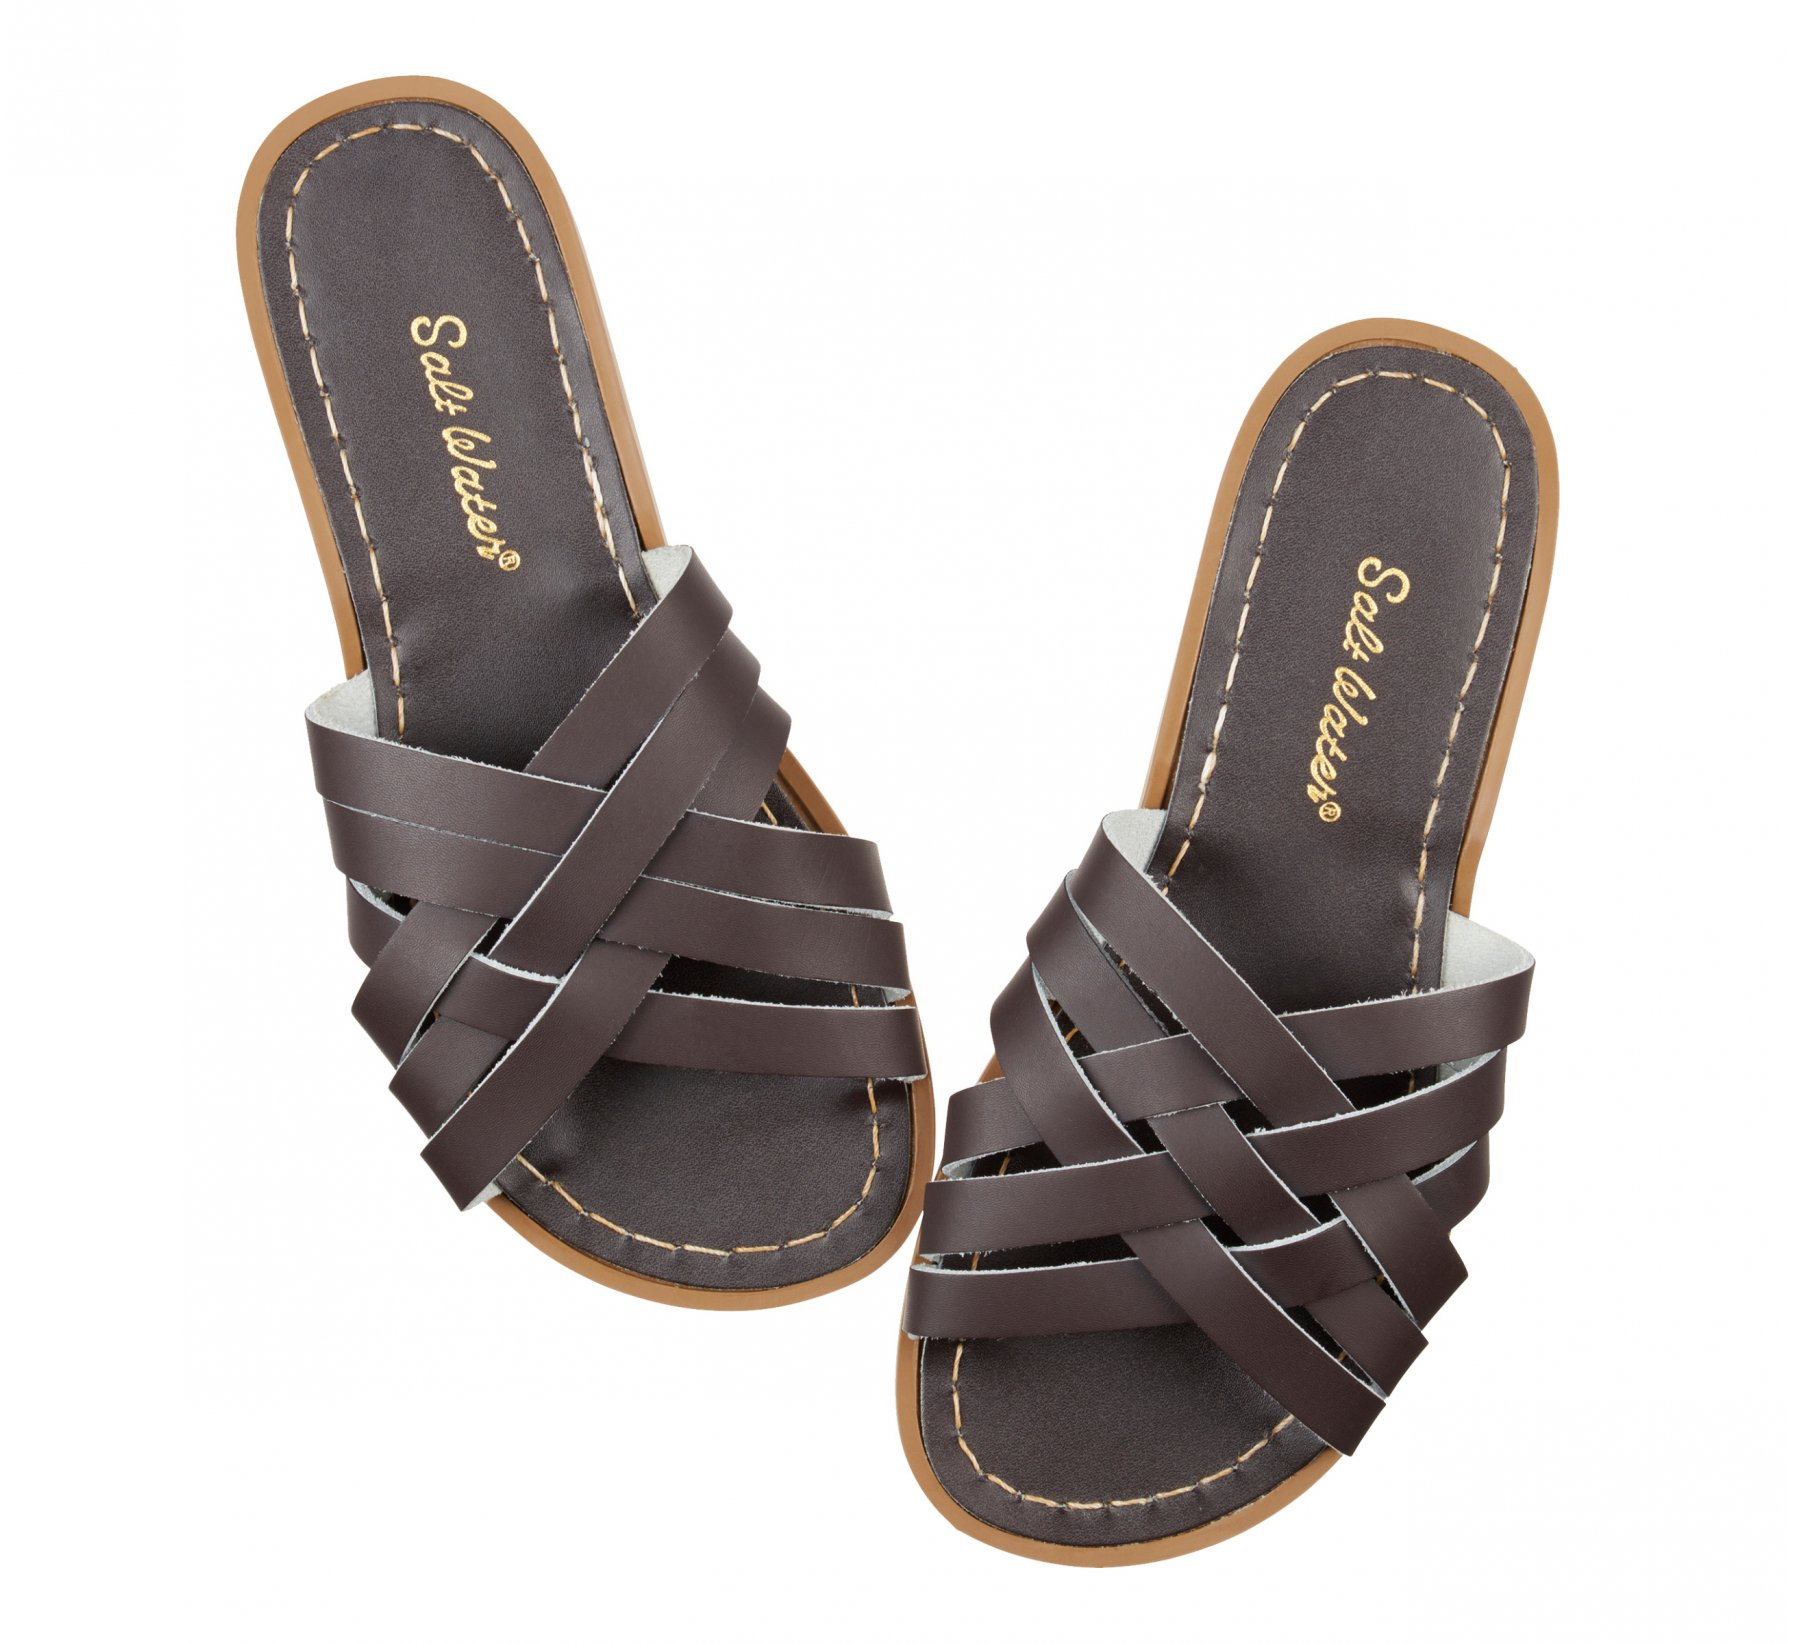 Retro Slide Cloklat - Salt Water Sandals